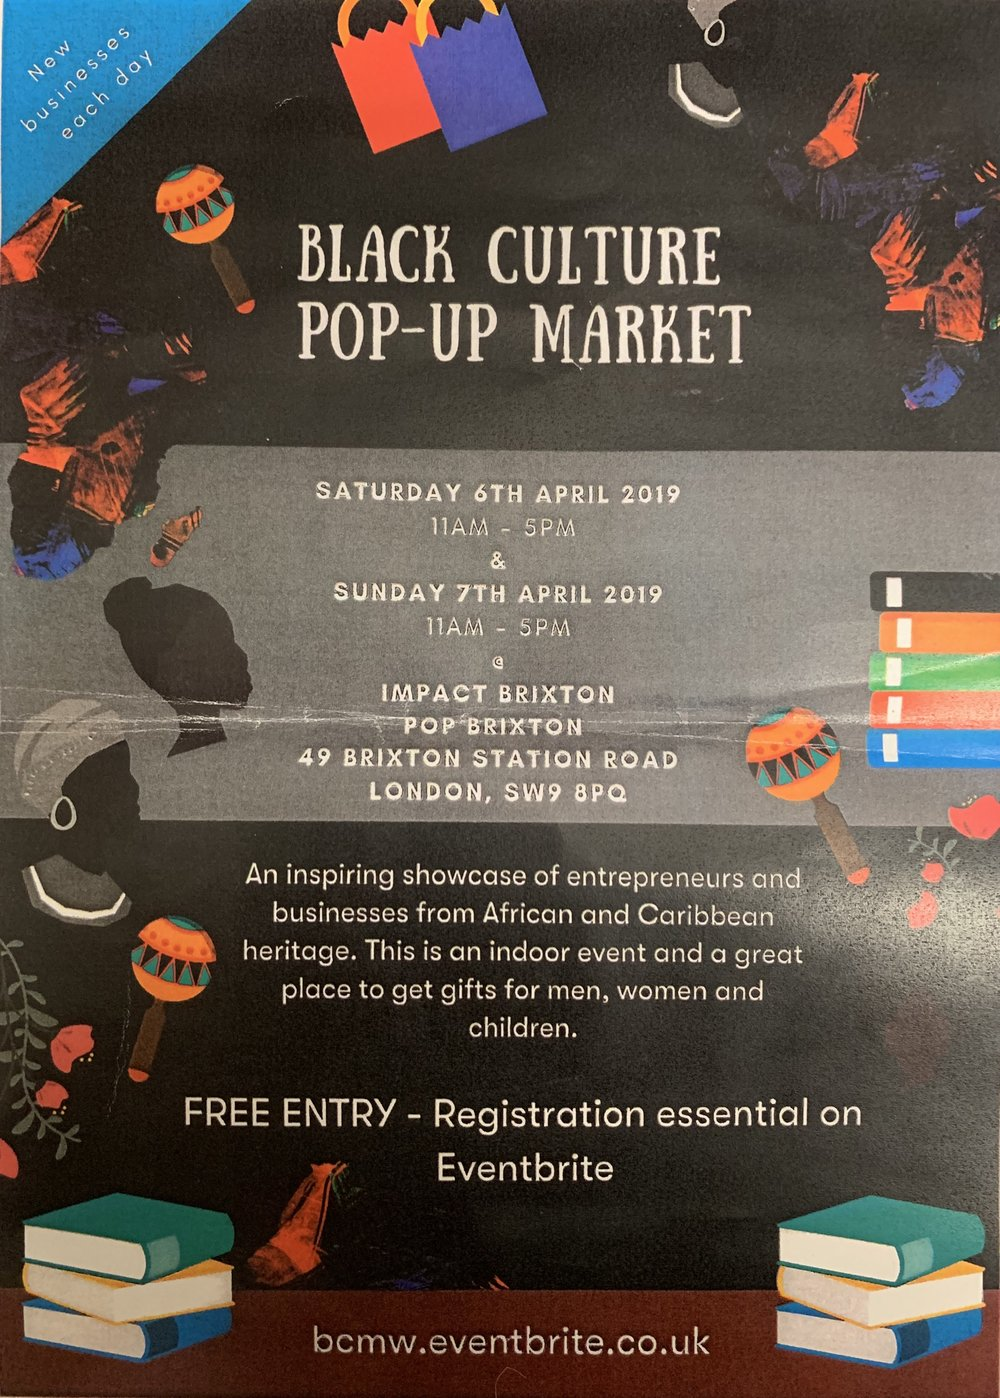 black culture pop-up market flyer.JPG